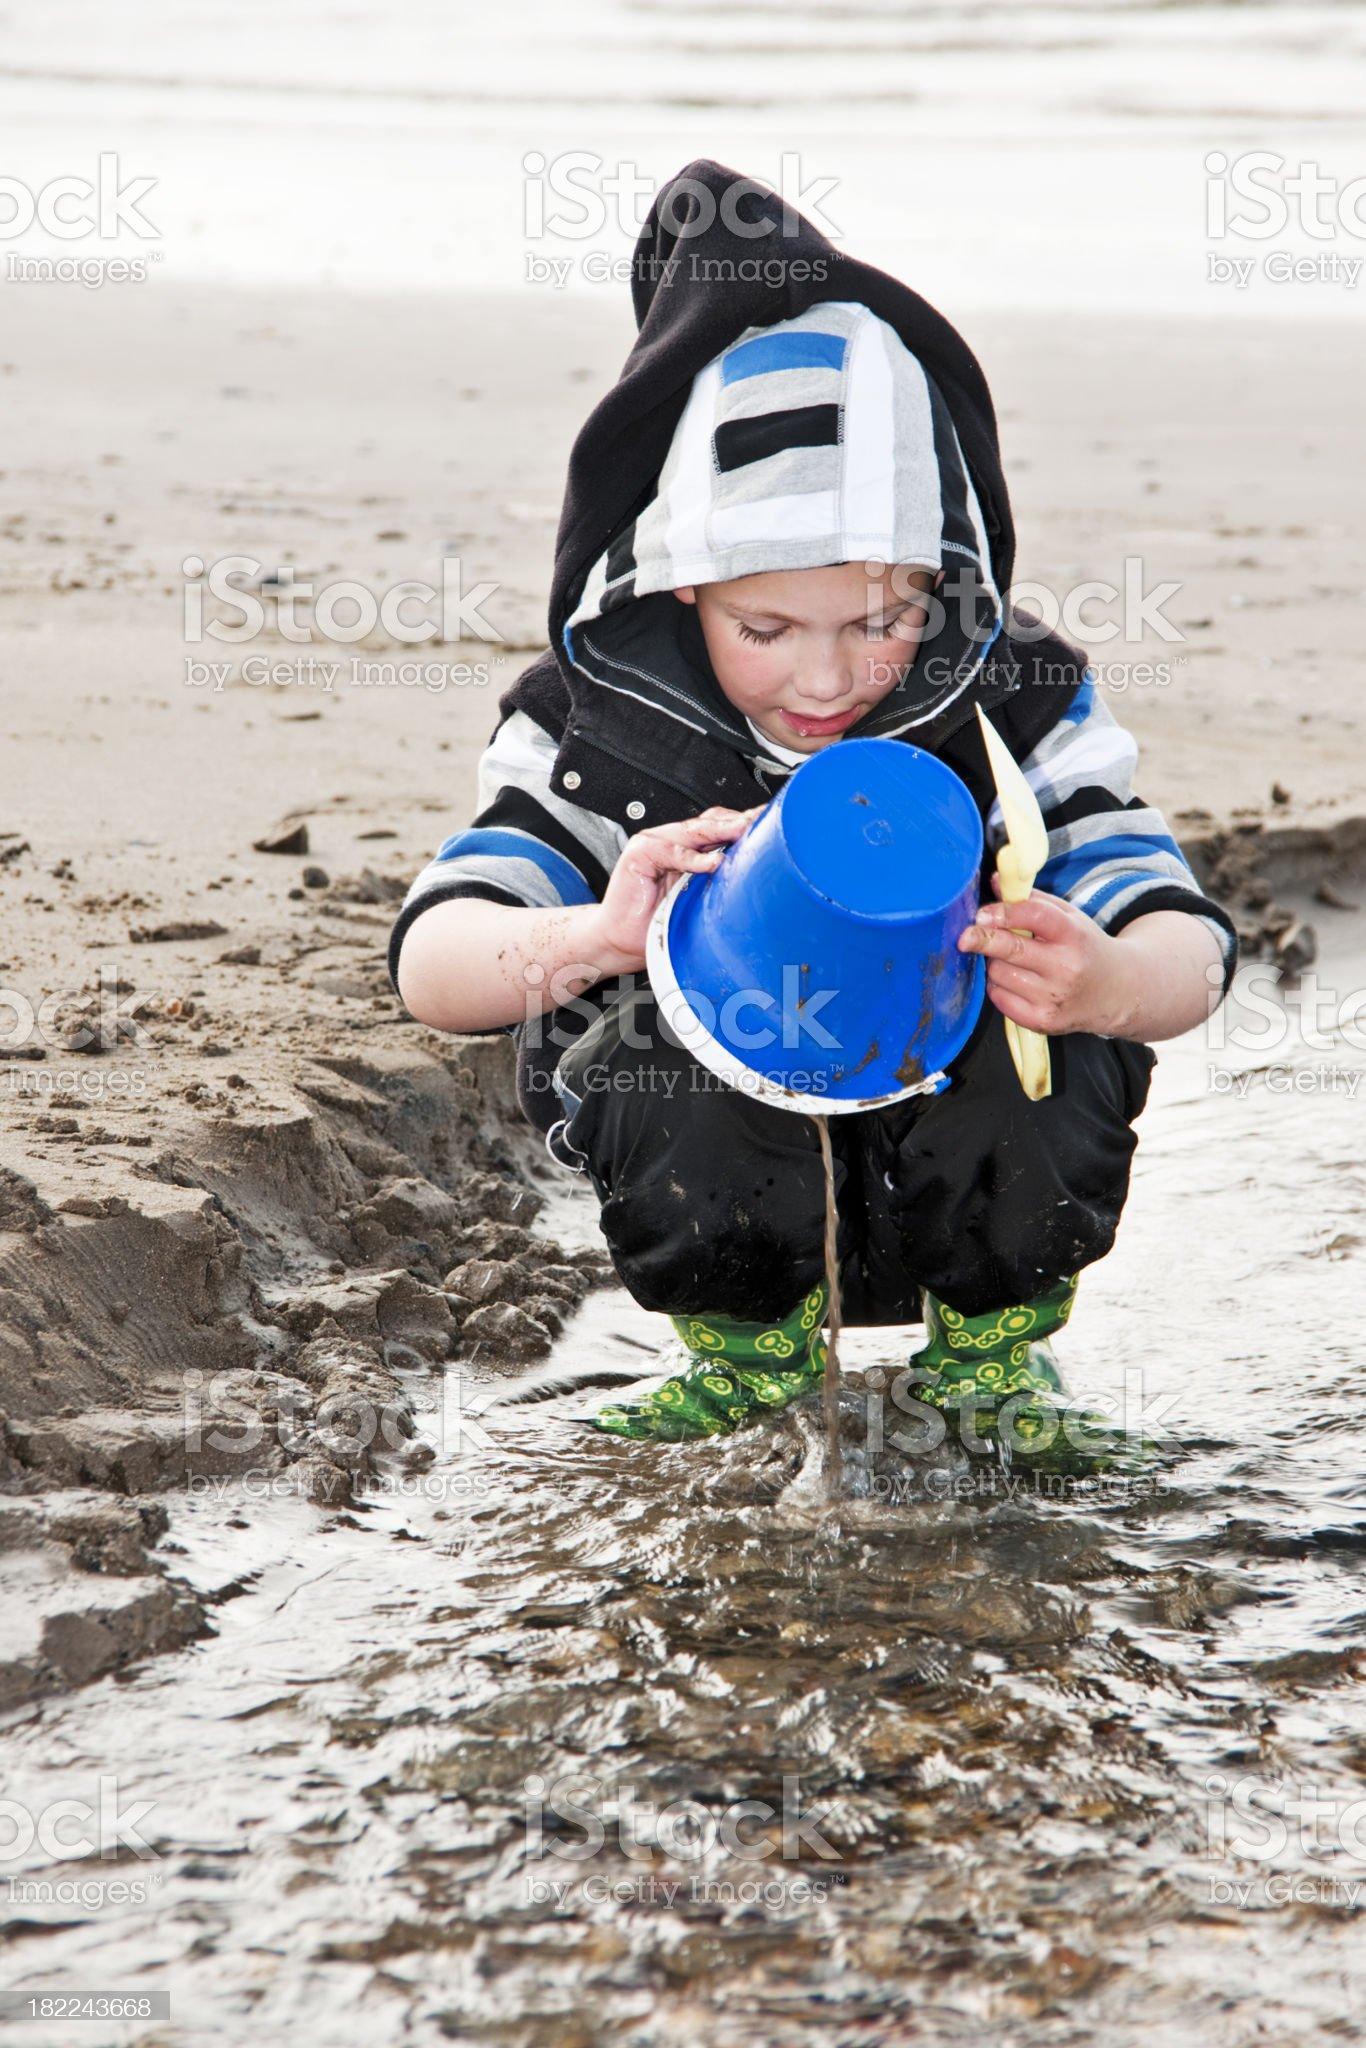 boy with bucket on beach royalty-free stock photo